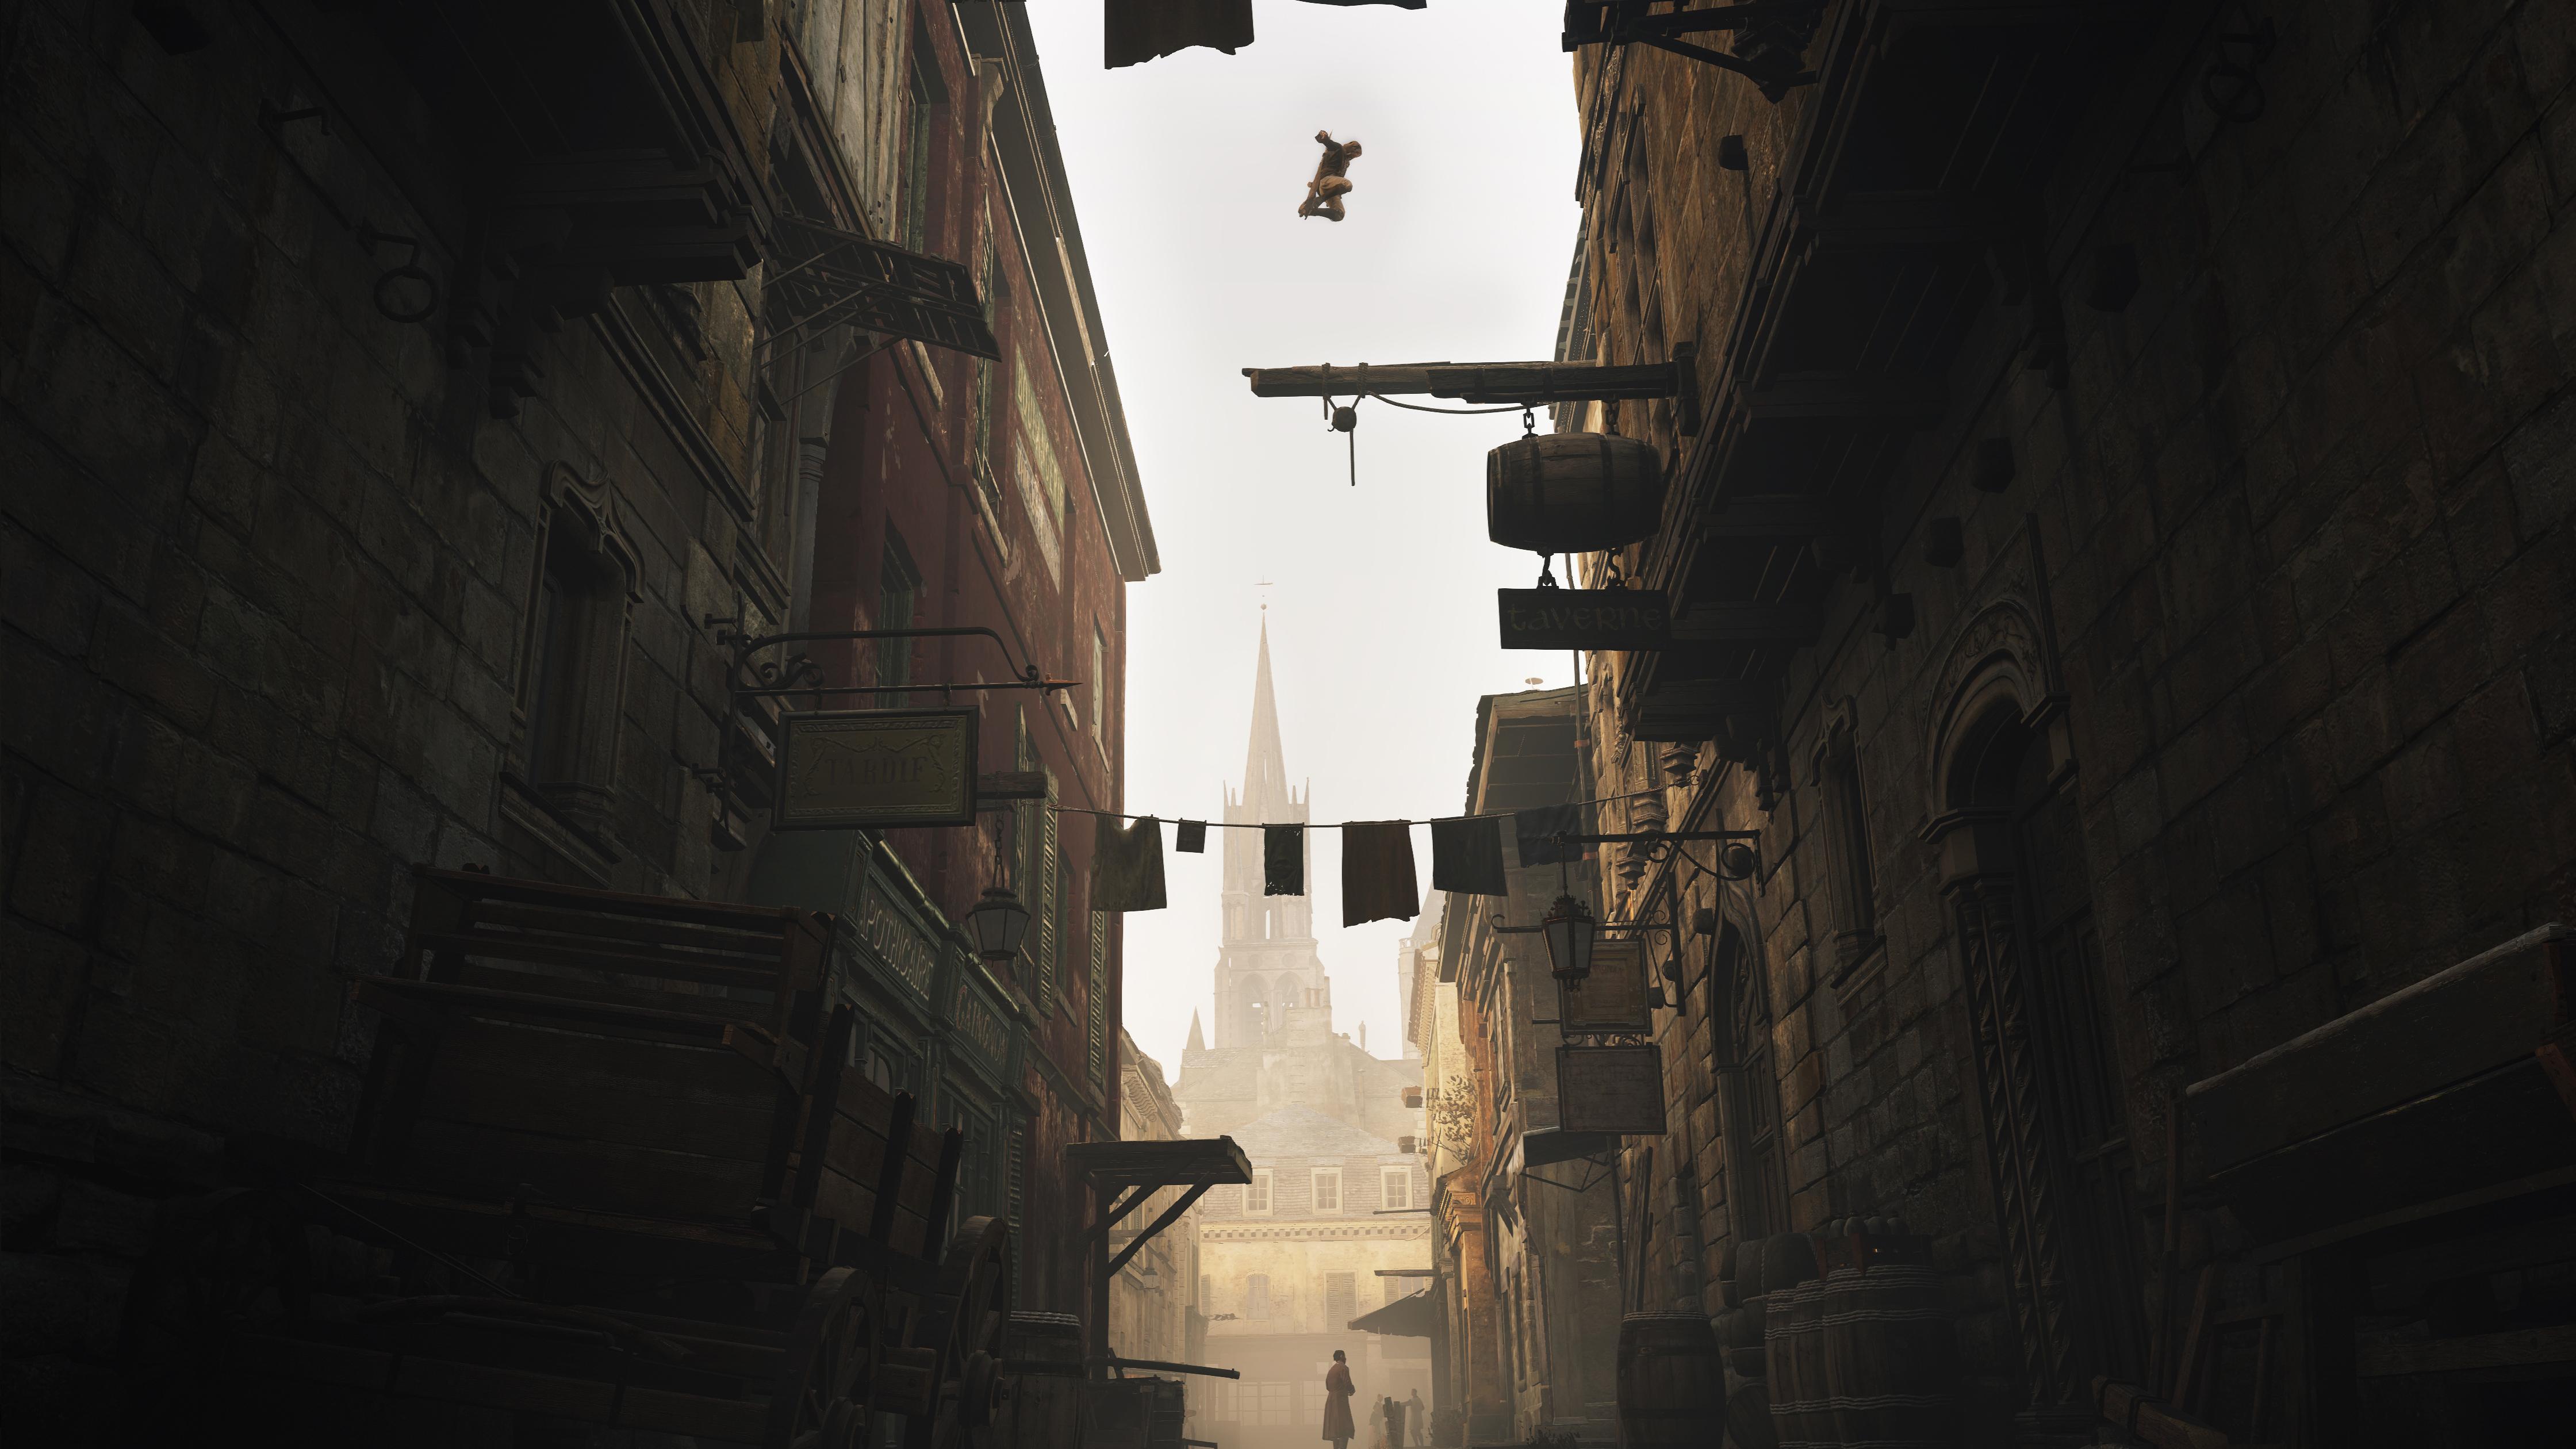 ACU_Dead-Kings_DLC_2-Flying_Street_1411403096